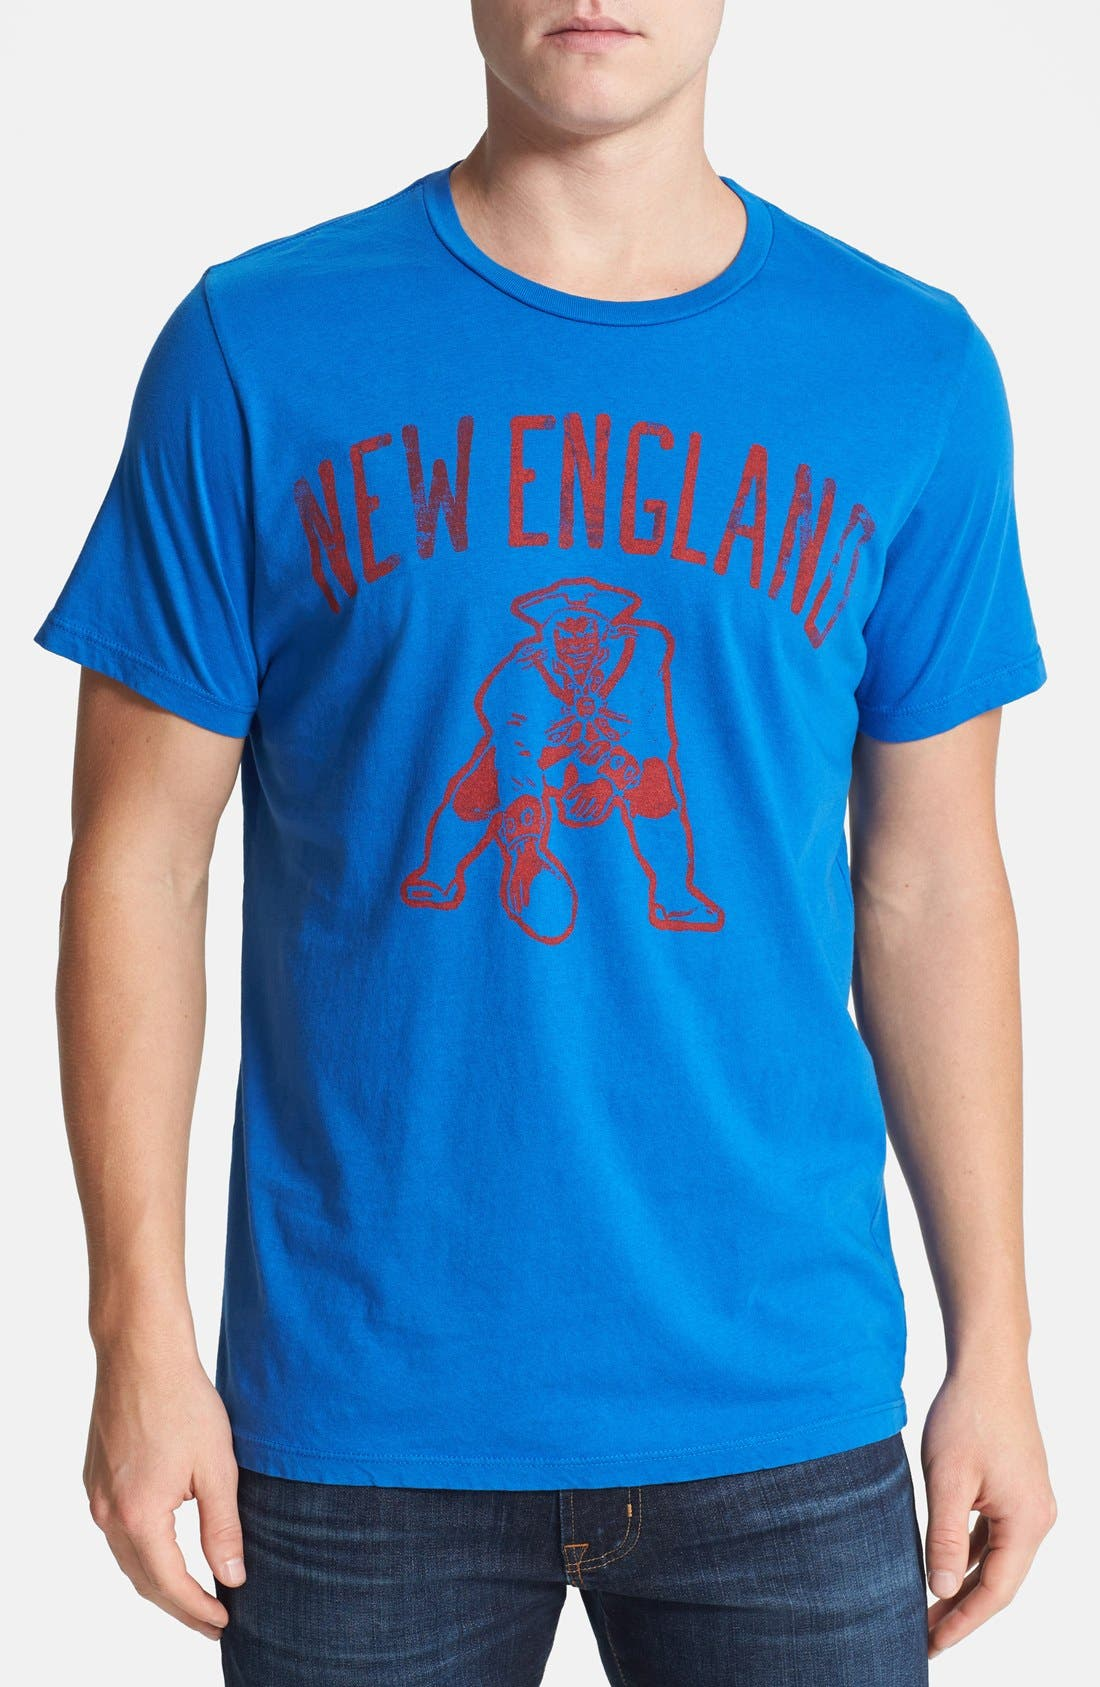 Main Image - Junk Food 'New England Patriots' Graphic T-Shirt